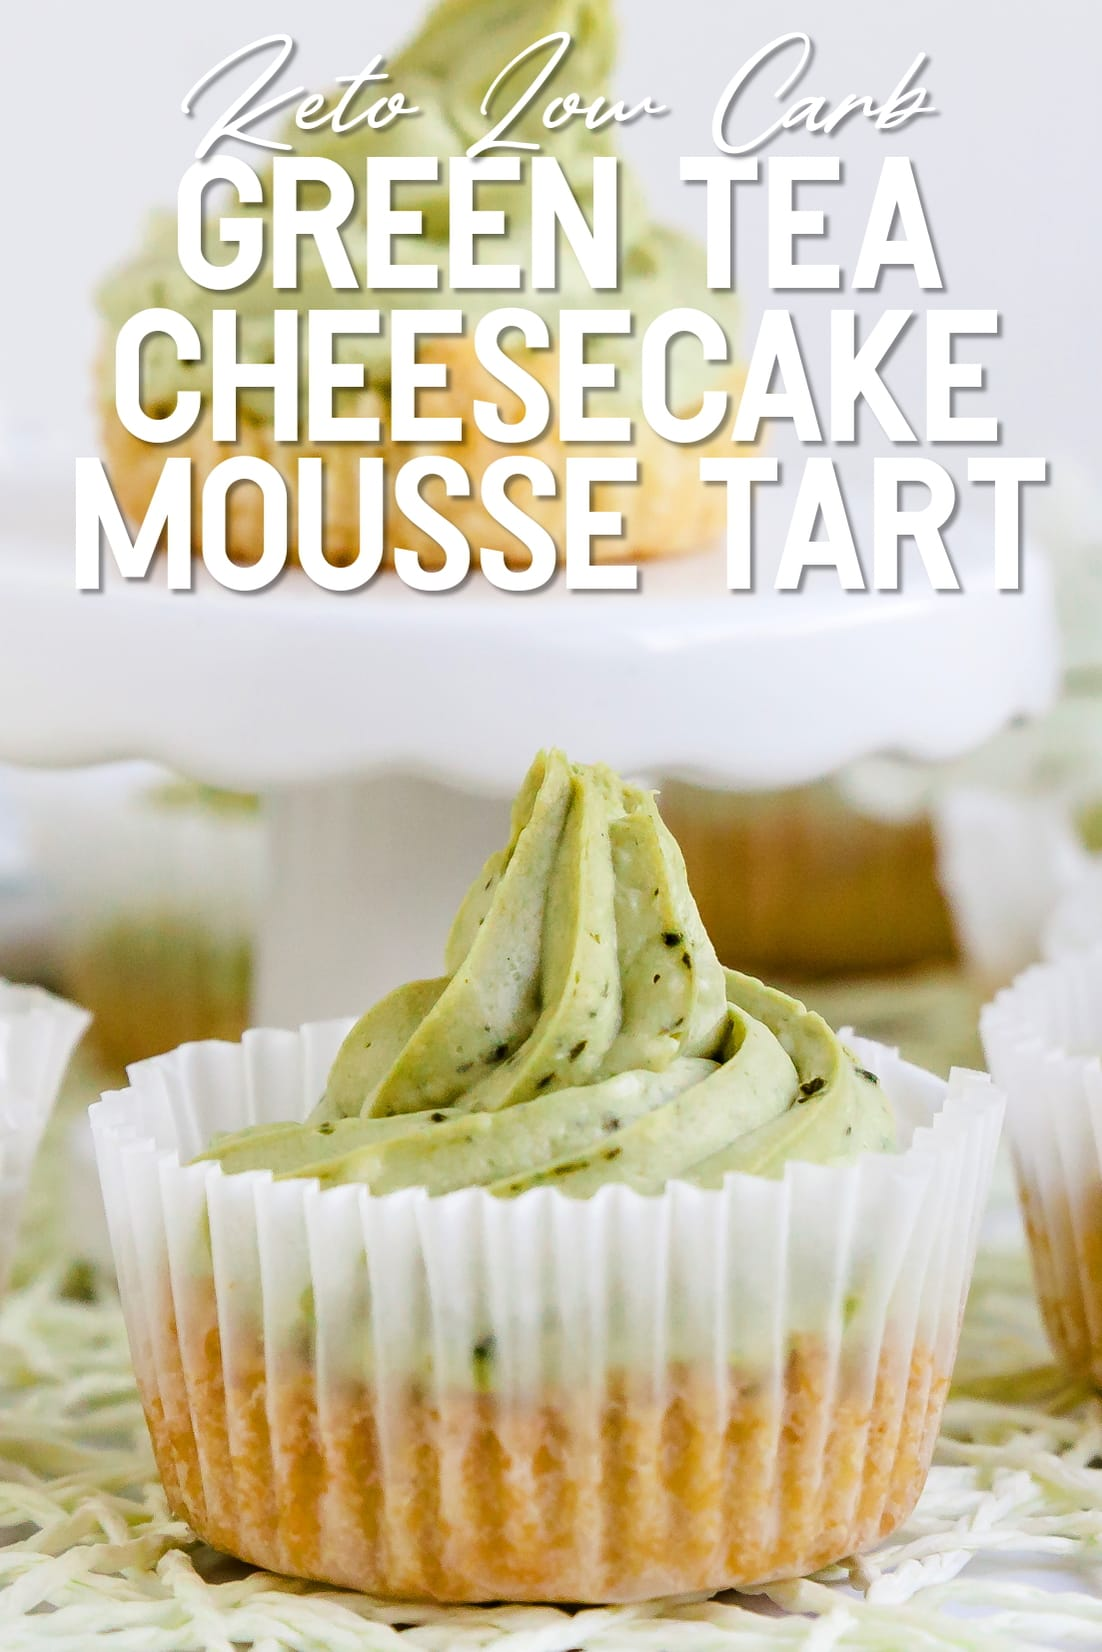 Green Tea Cheesecake Mousse Tart close up